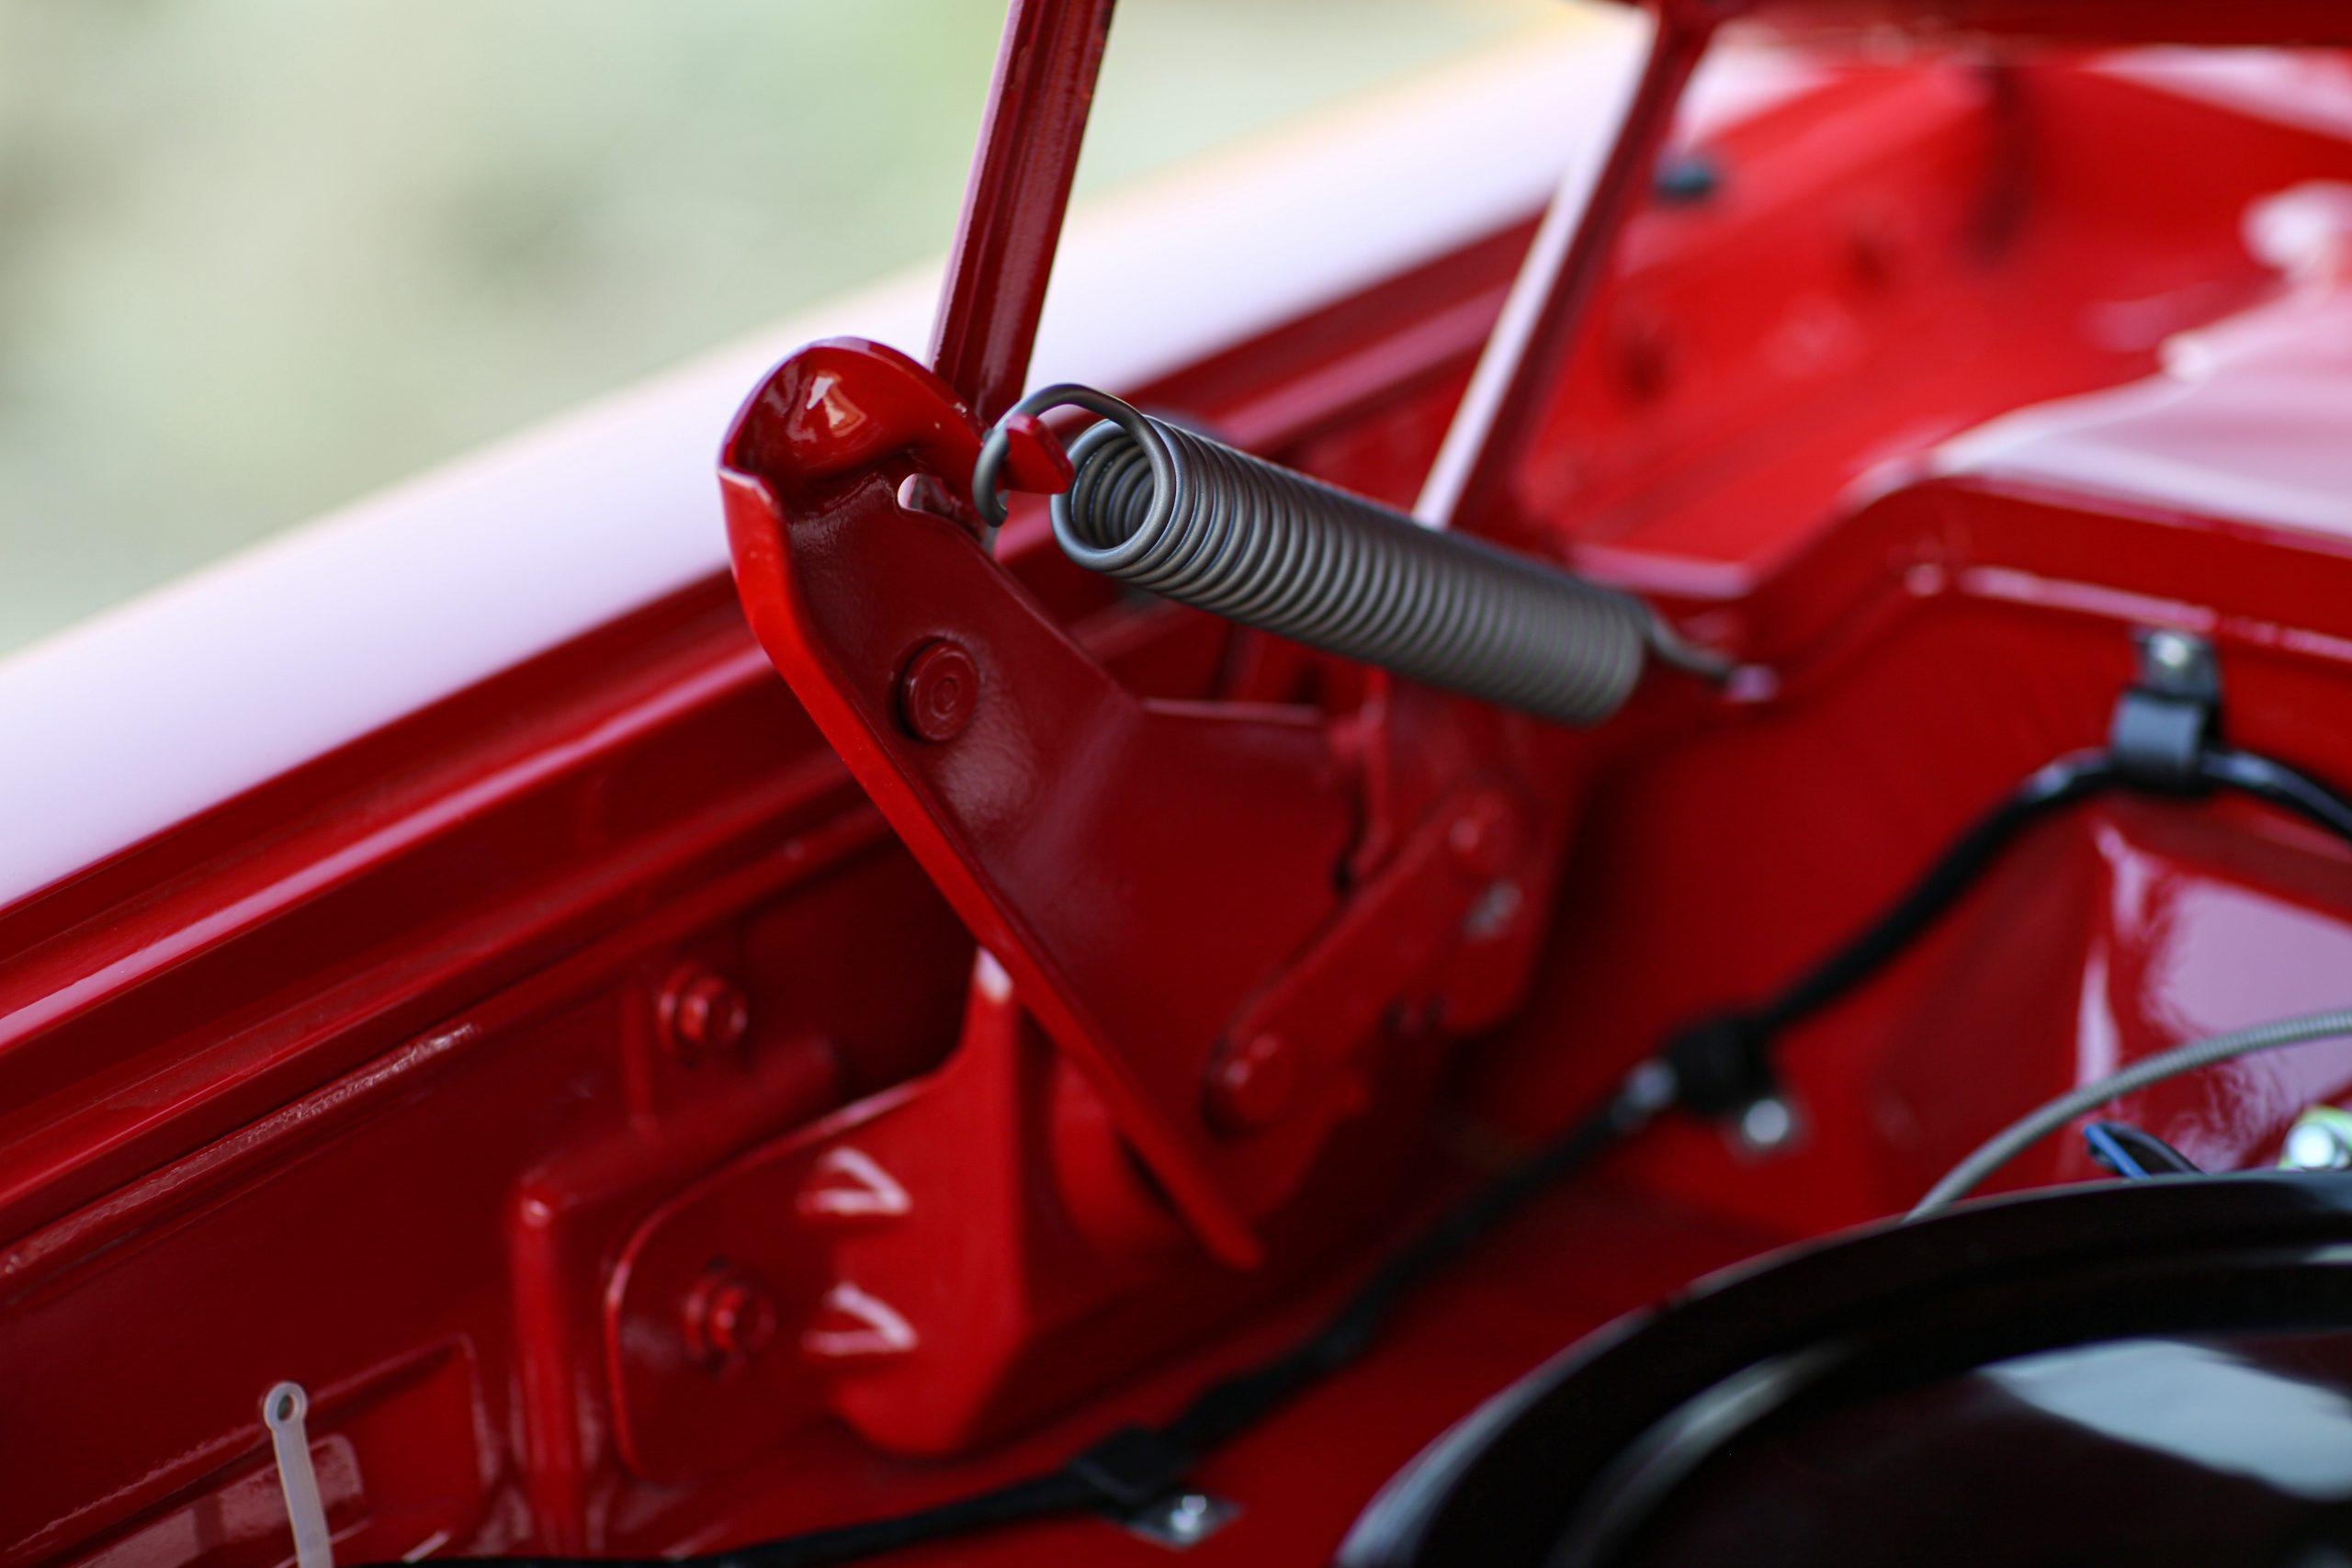 1963 Plymouth 426 Max Wedge lightweight hood hinge spring